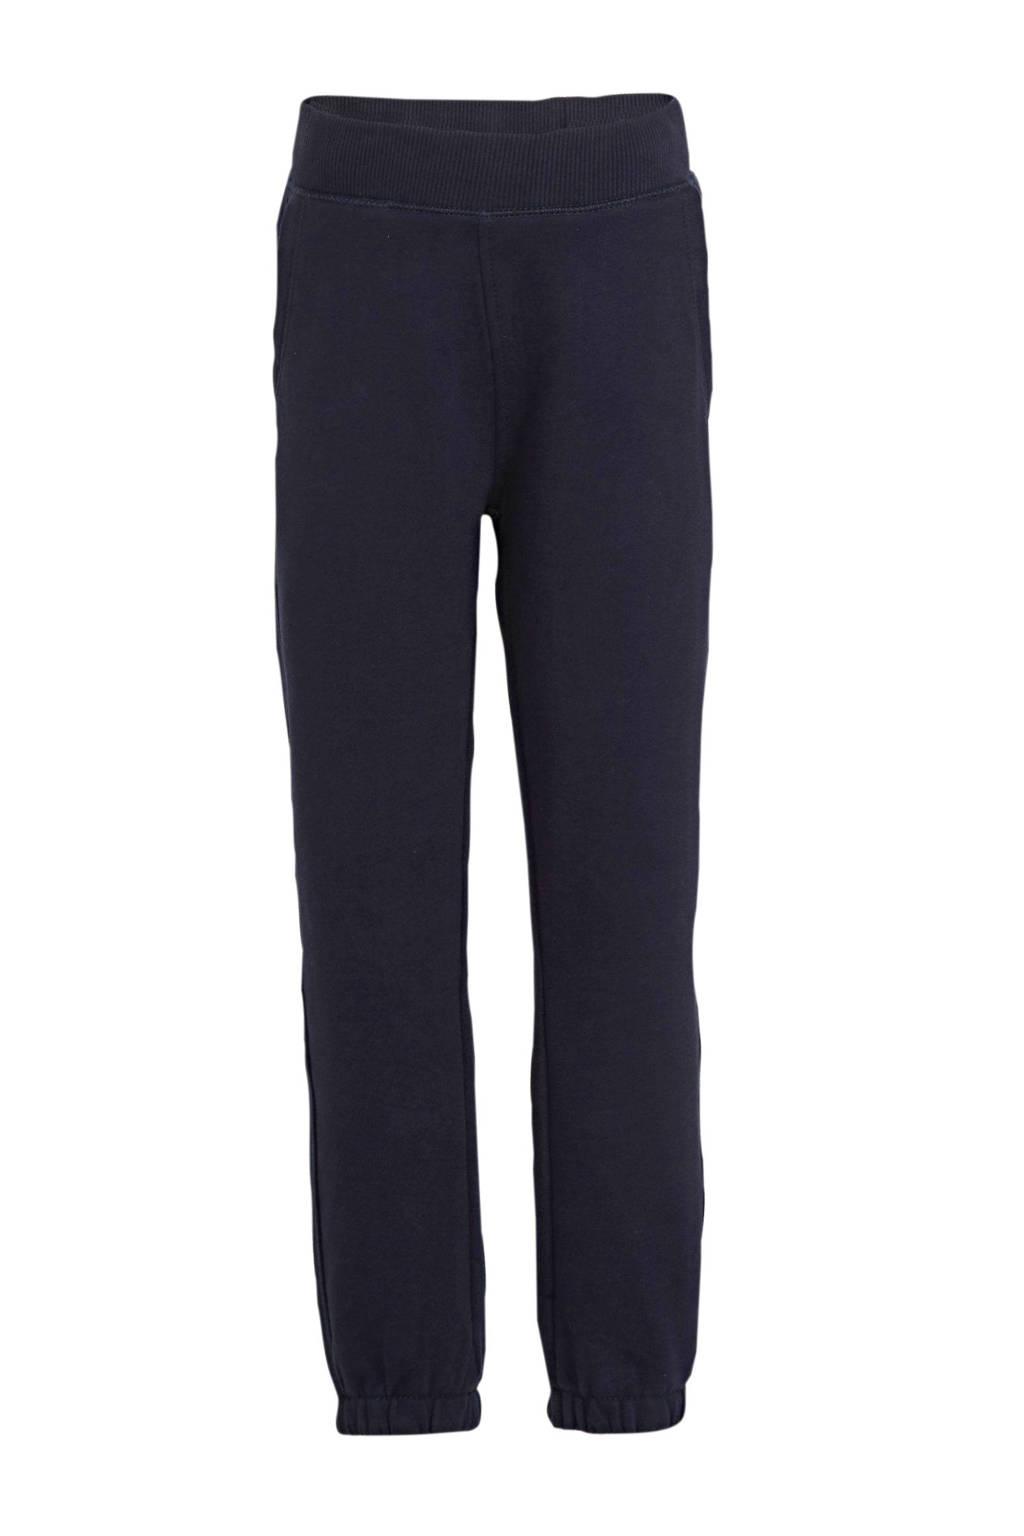 s.Oliver regular fit broek donkerblauw, Donkerblauw